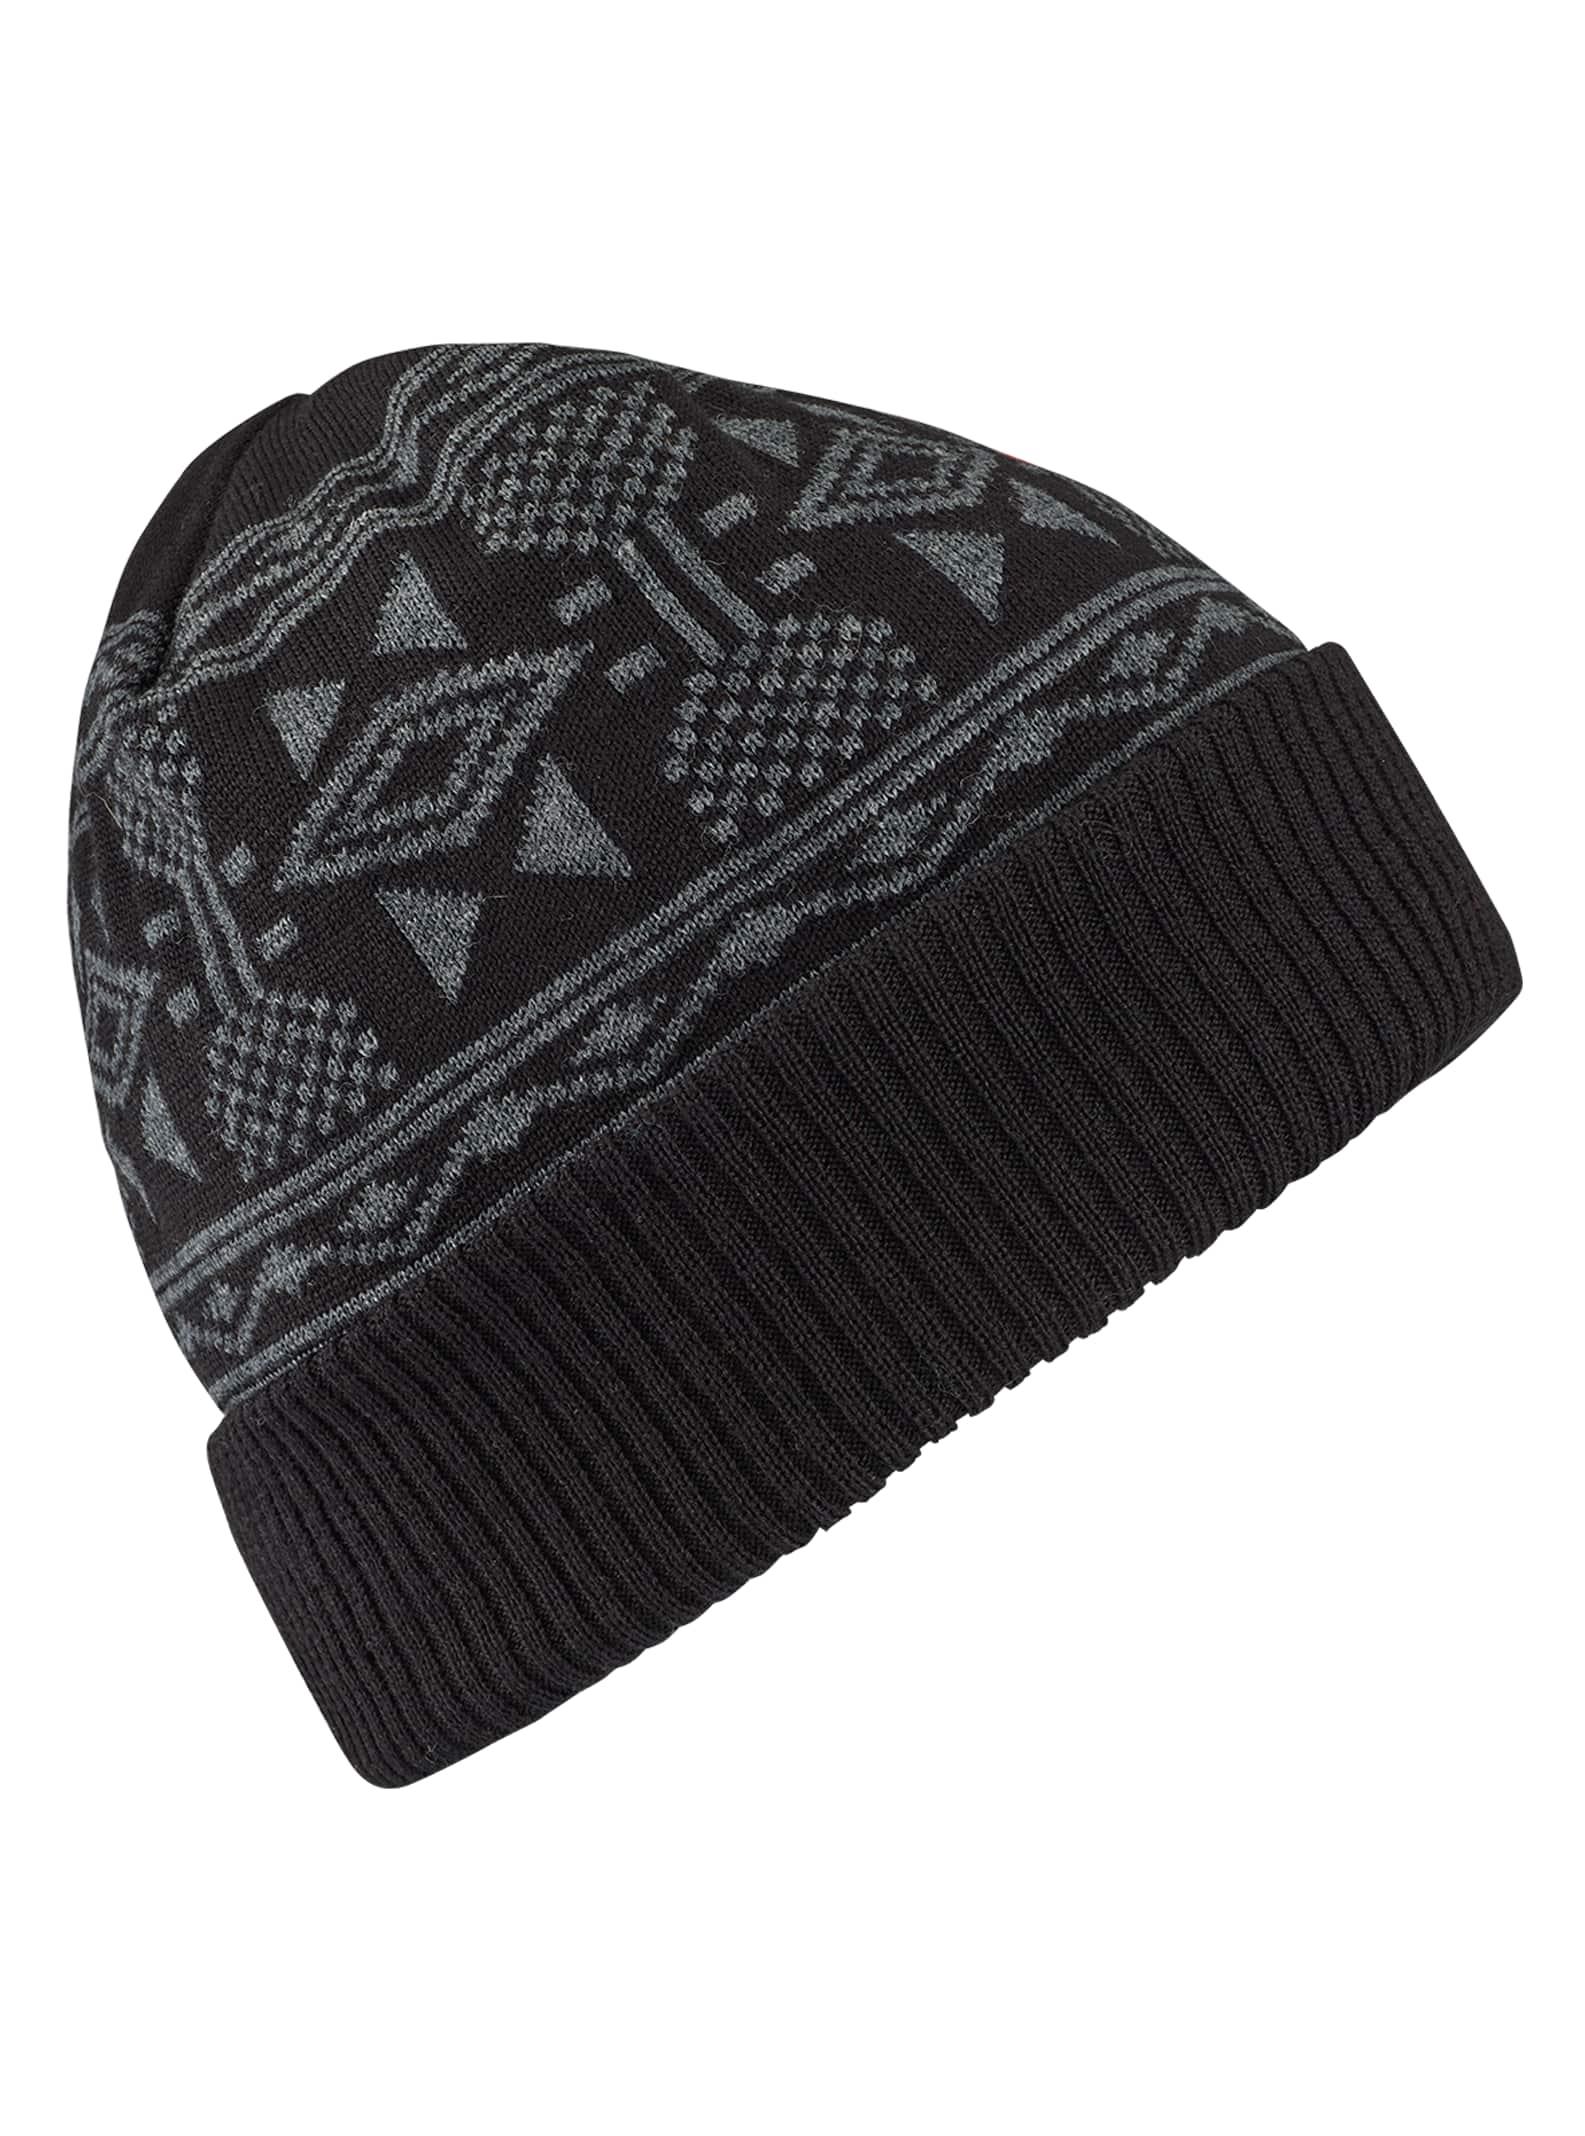 655a9af7d Women's Sale Hats & Beanies | Burton Snowboards